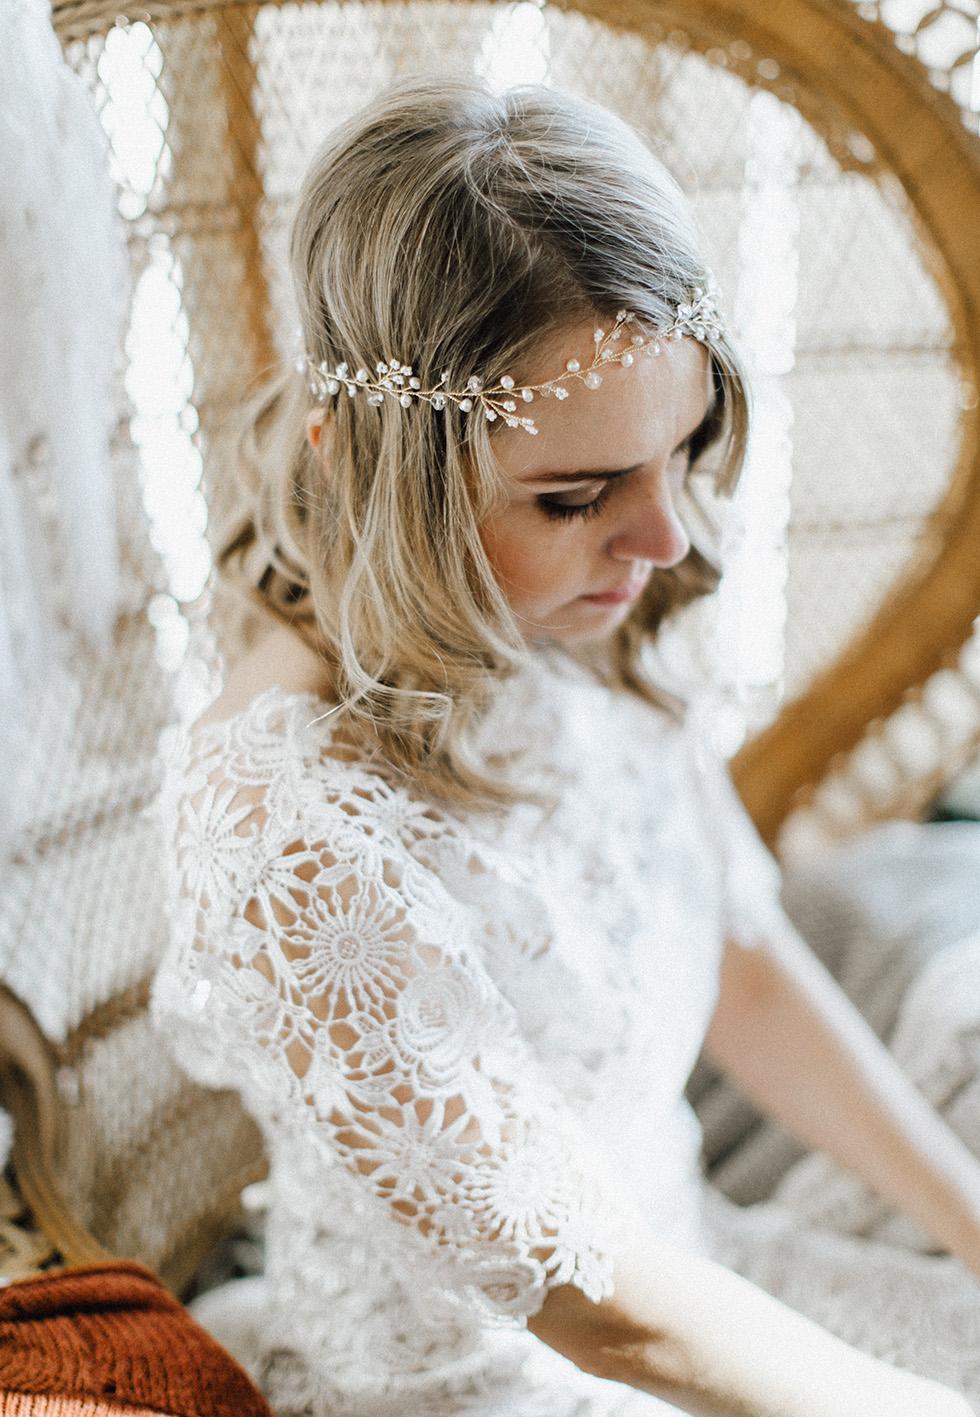 Traumanufaktur_Schloss_Diersford_Bohemian_Wedding_Boho_Hochzeit_Hochzeitsfotograf_065.jpg